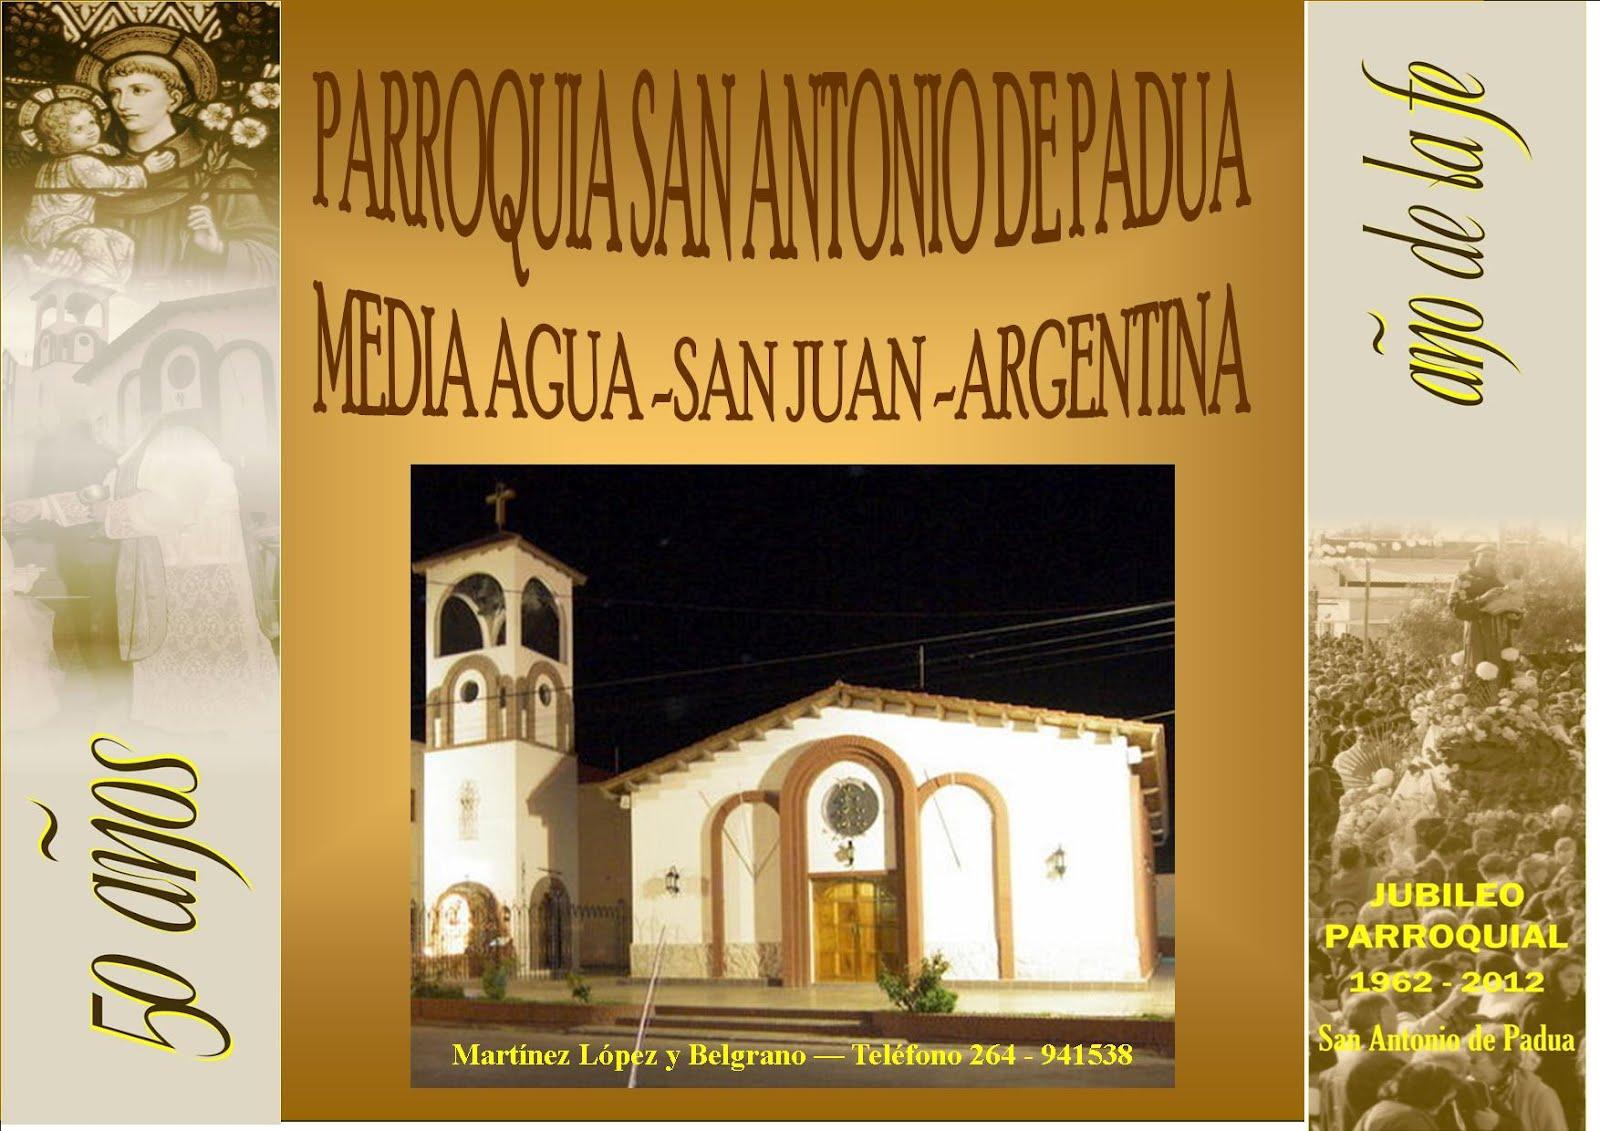 PARROQUIA SAN ANTONIO DE PADUA - MEDIA AGUA - SAN JUAN - ARGENTINA